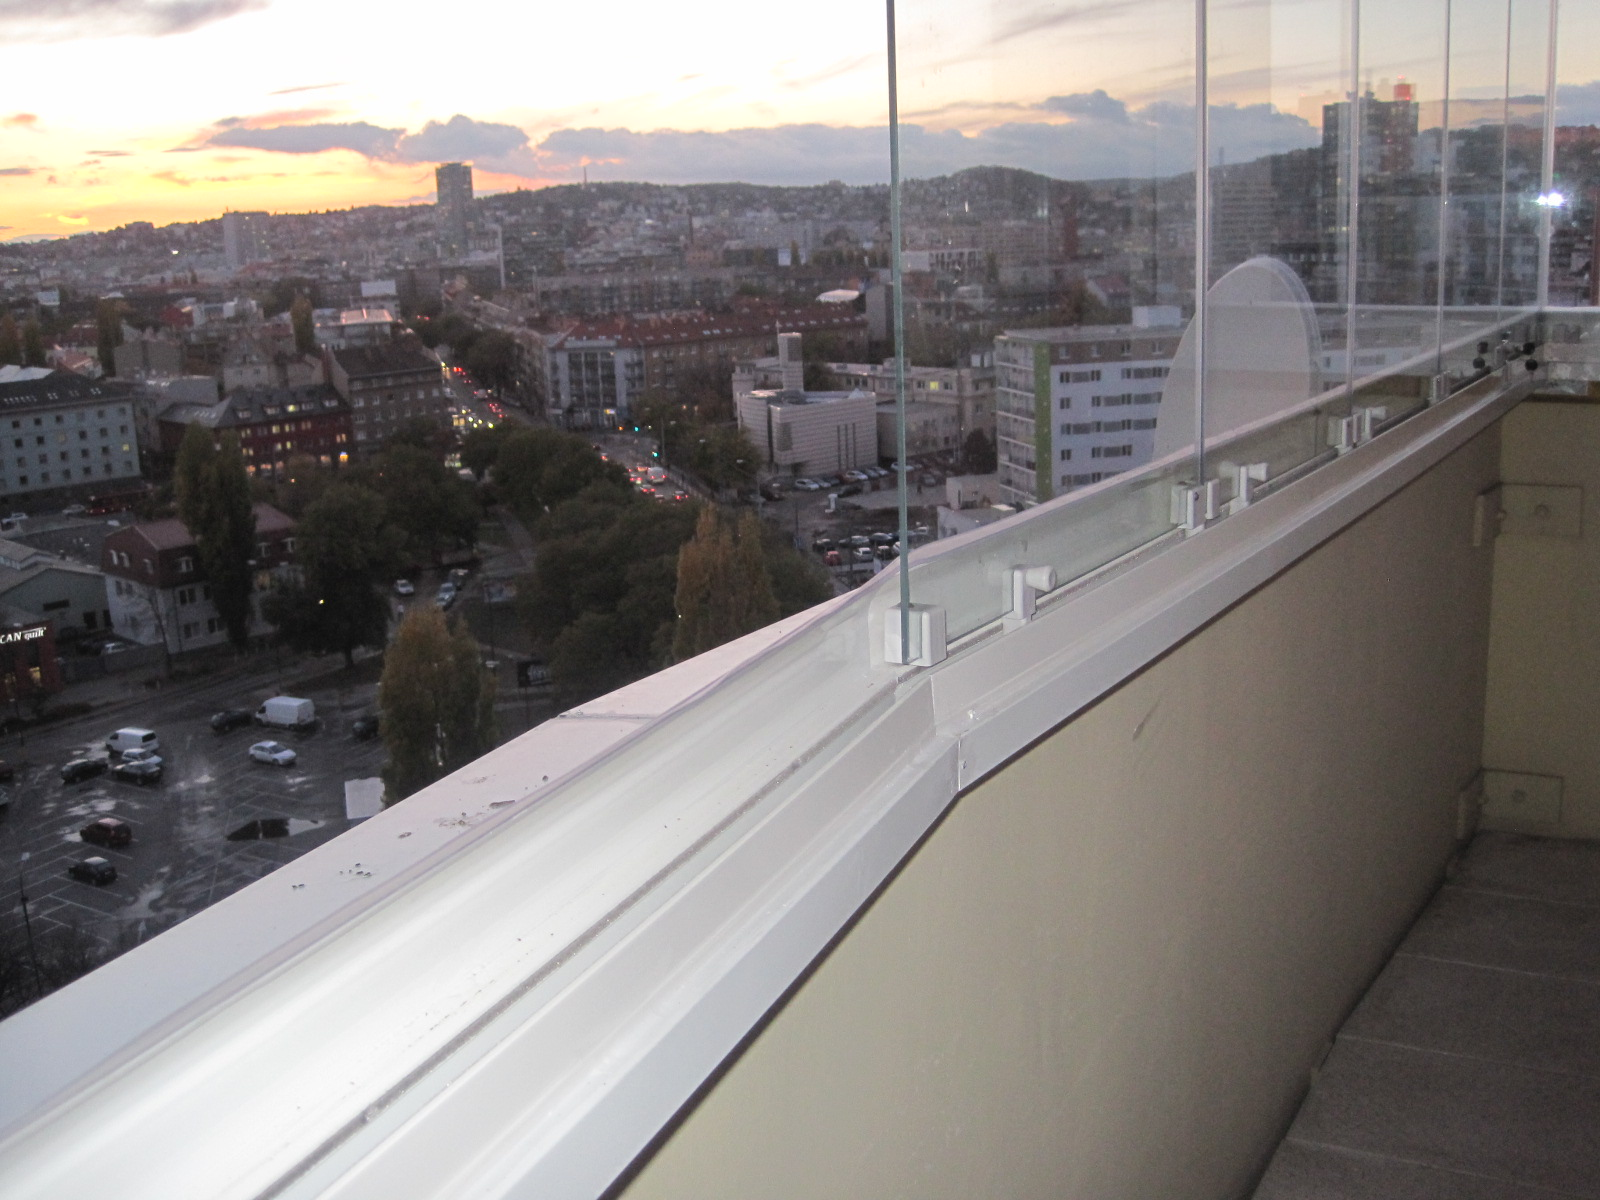 Balkonverglasung rahmenloses drehsystem aluvista bratislava ruzinov pifema s r o - Trennwand schiebesystem ...